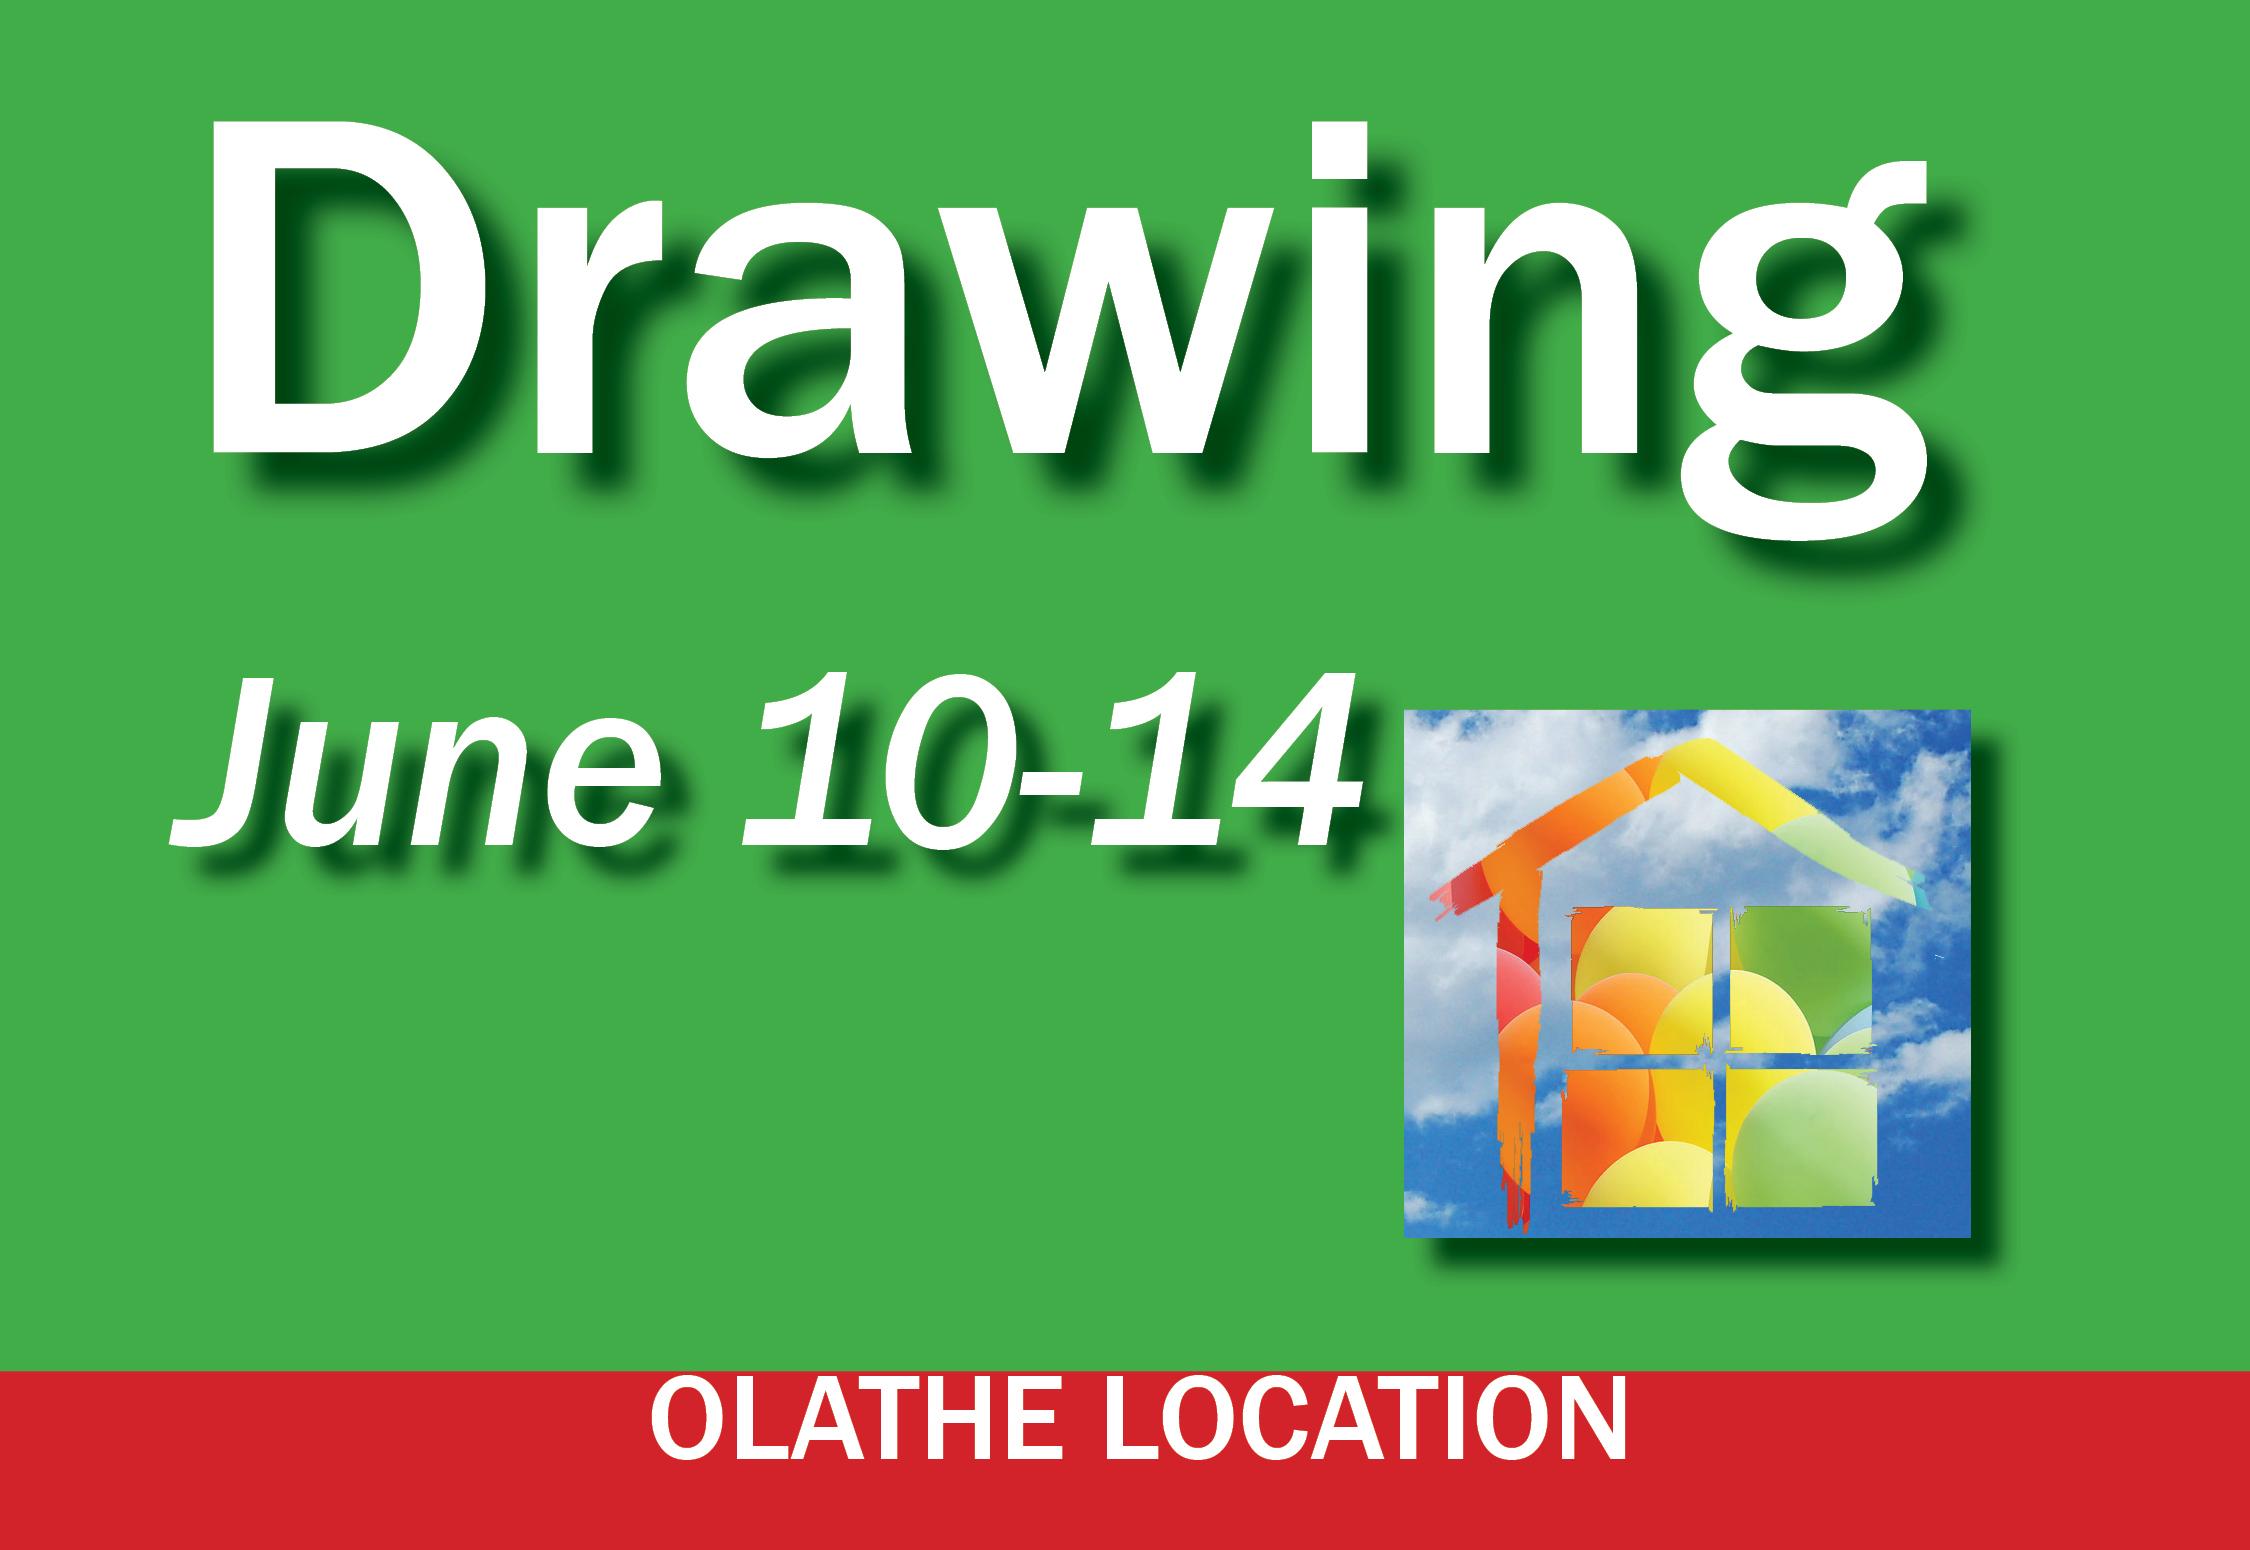 Drawing June 10-14 icon.jpg